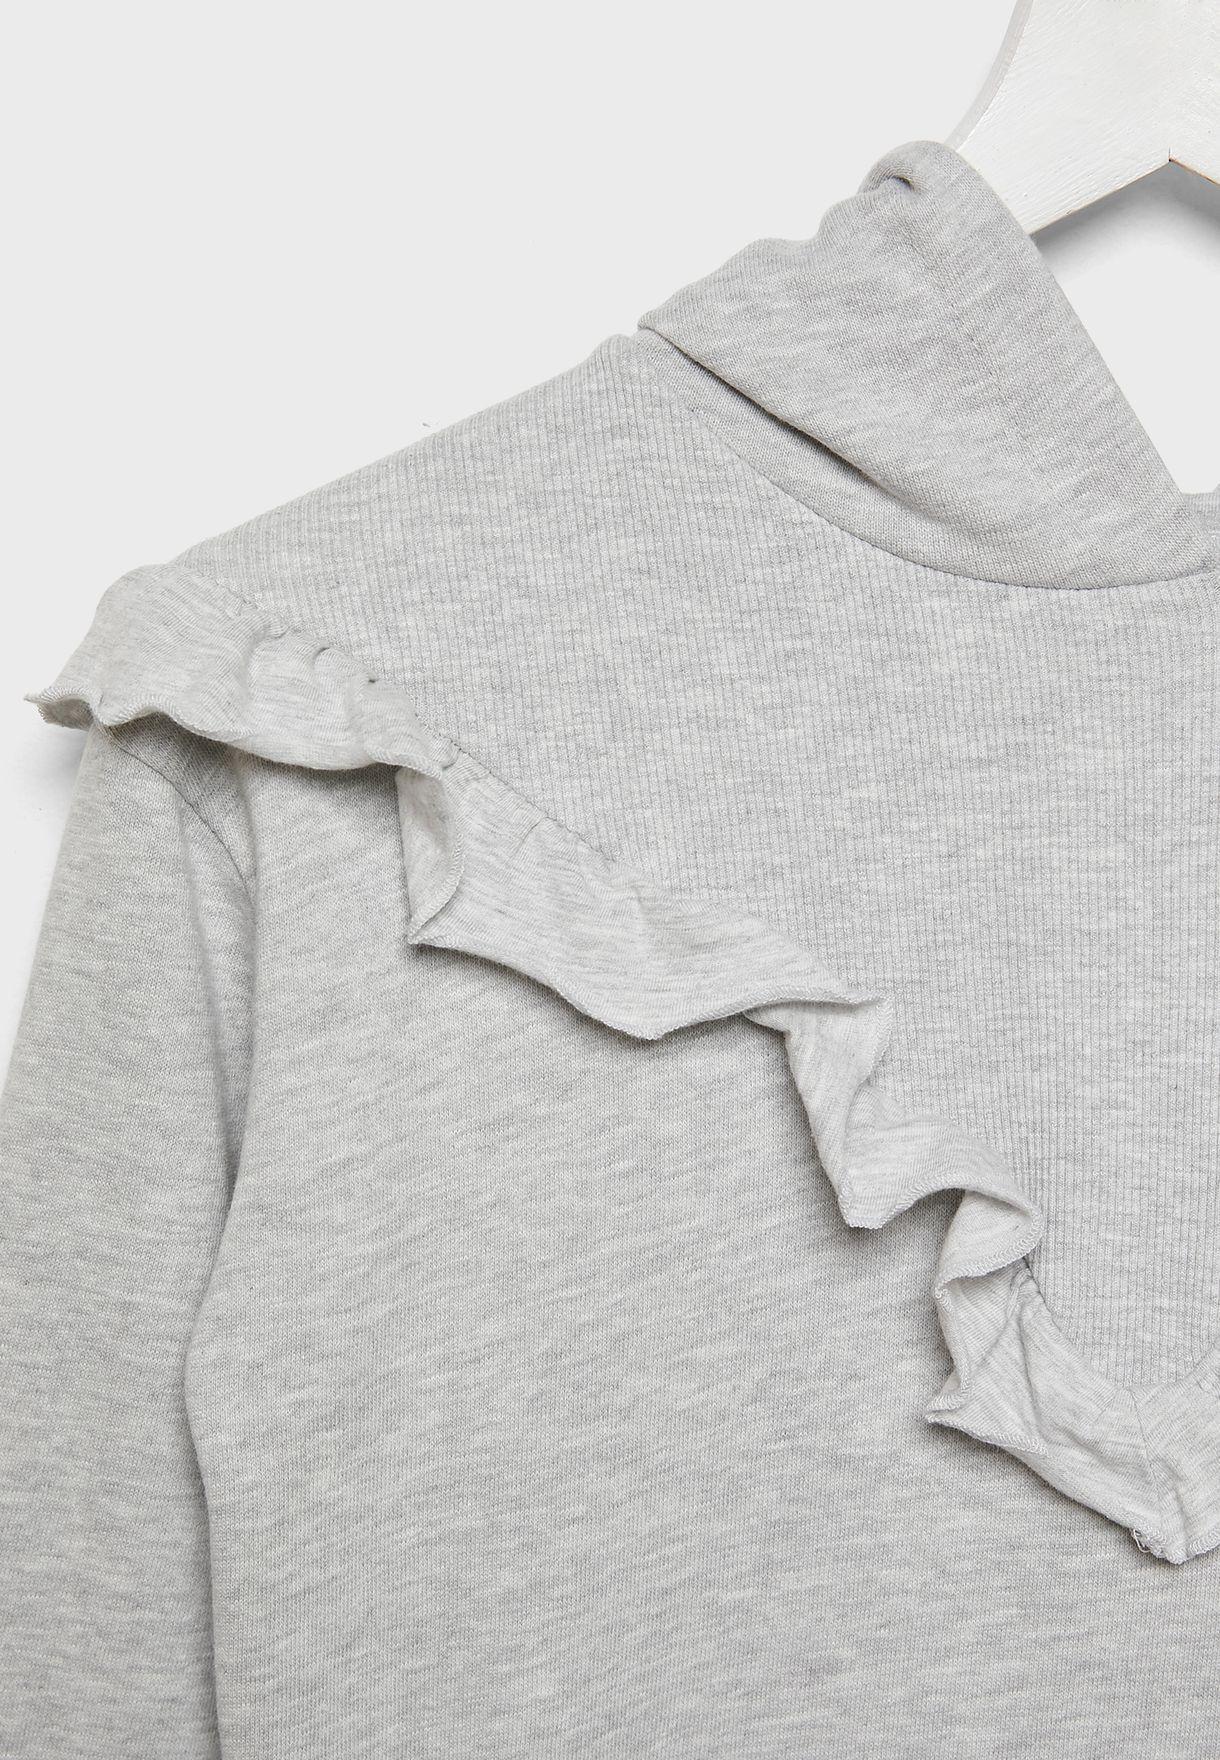 Kids Ruffle Detail Sweatshirt